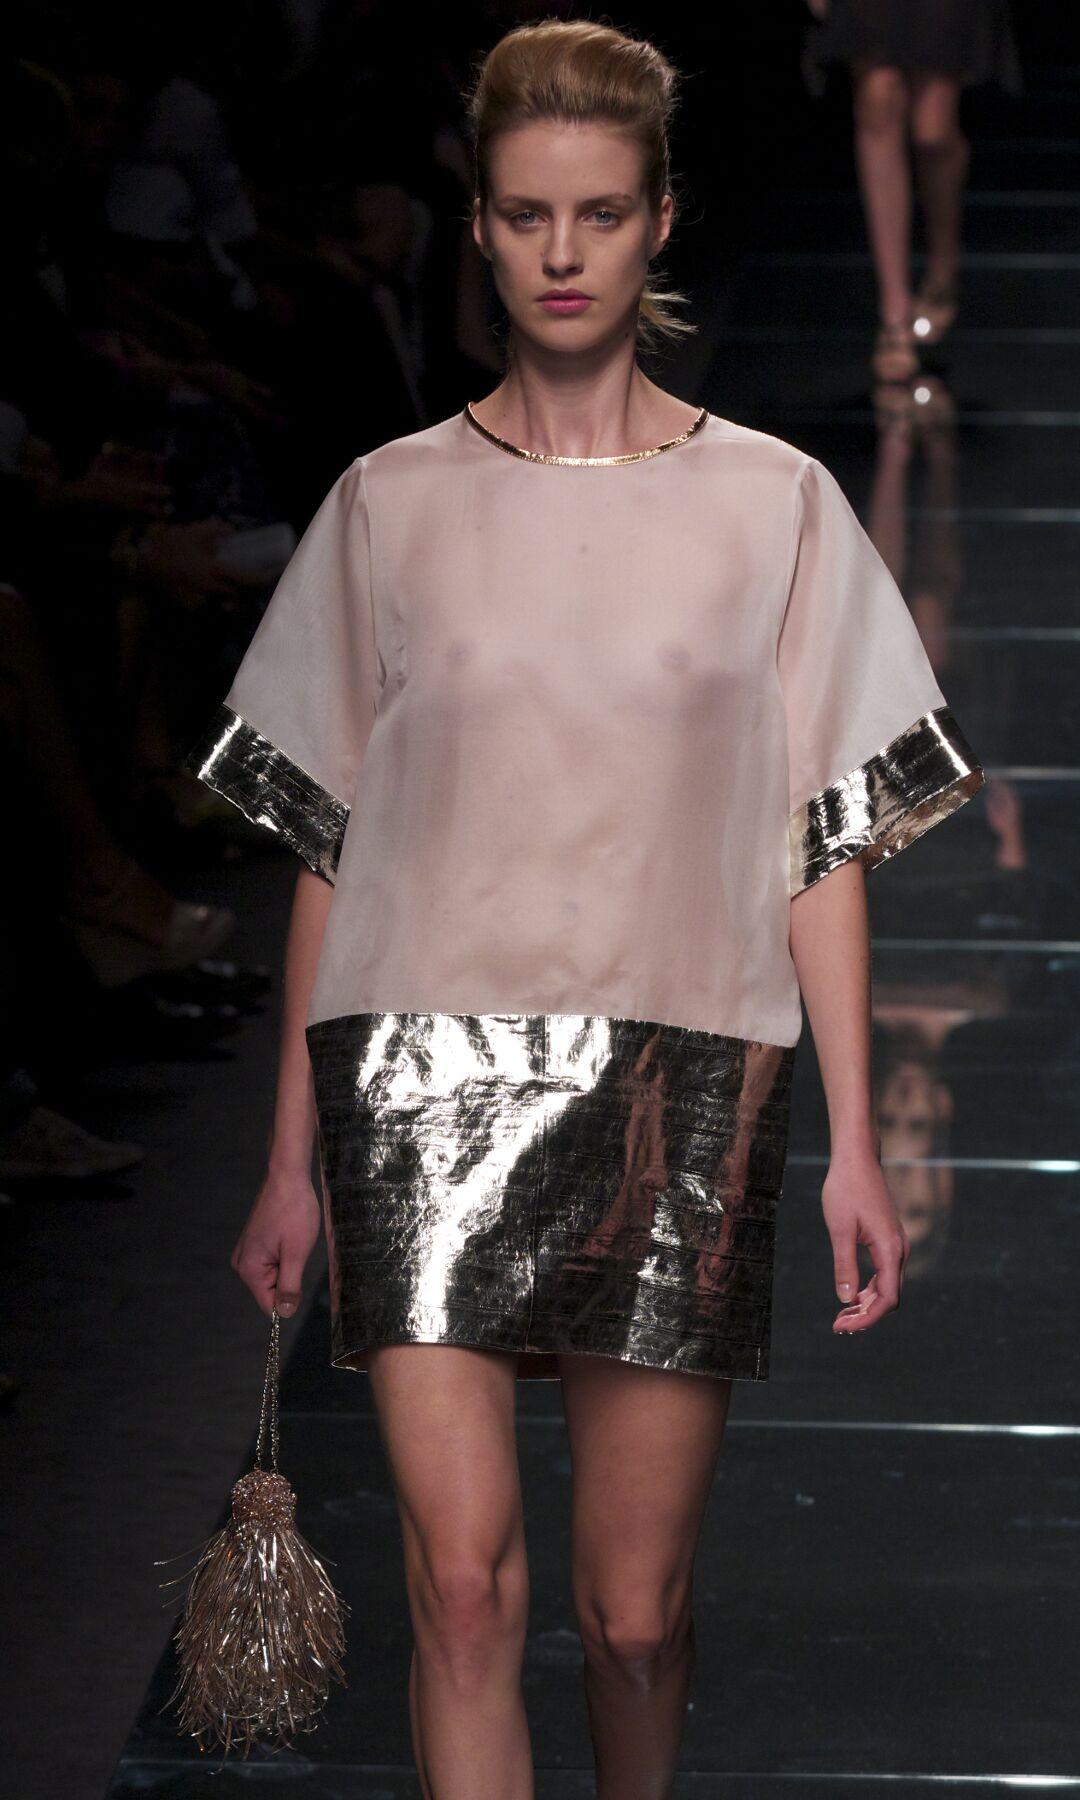 Catwalk Anteprima Woman Fashion Show Summer 2014